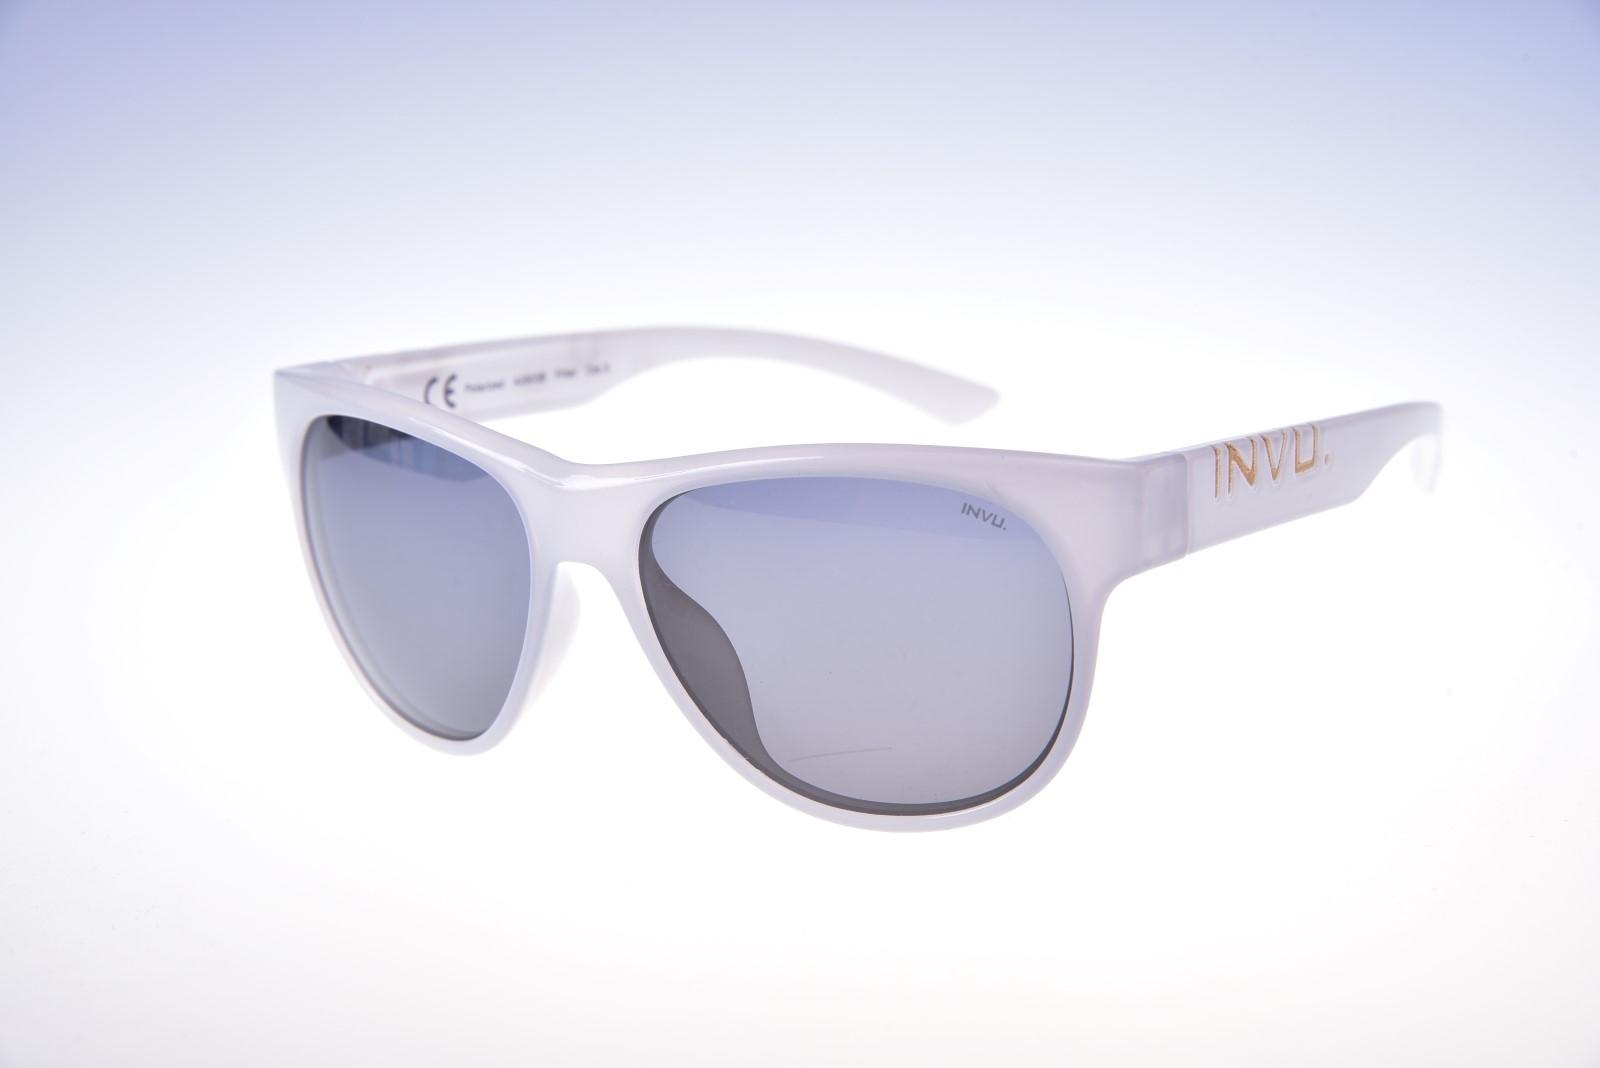 INVU. Active A2903B - Dámske slnečné okuliare